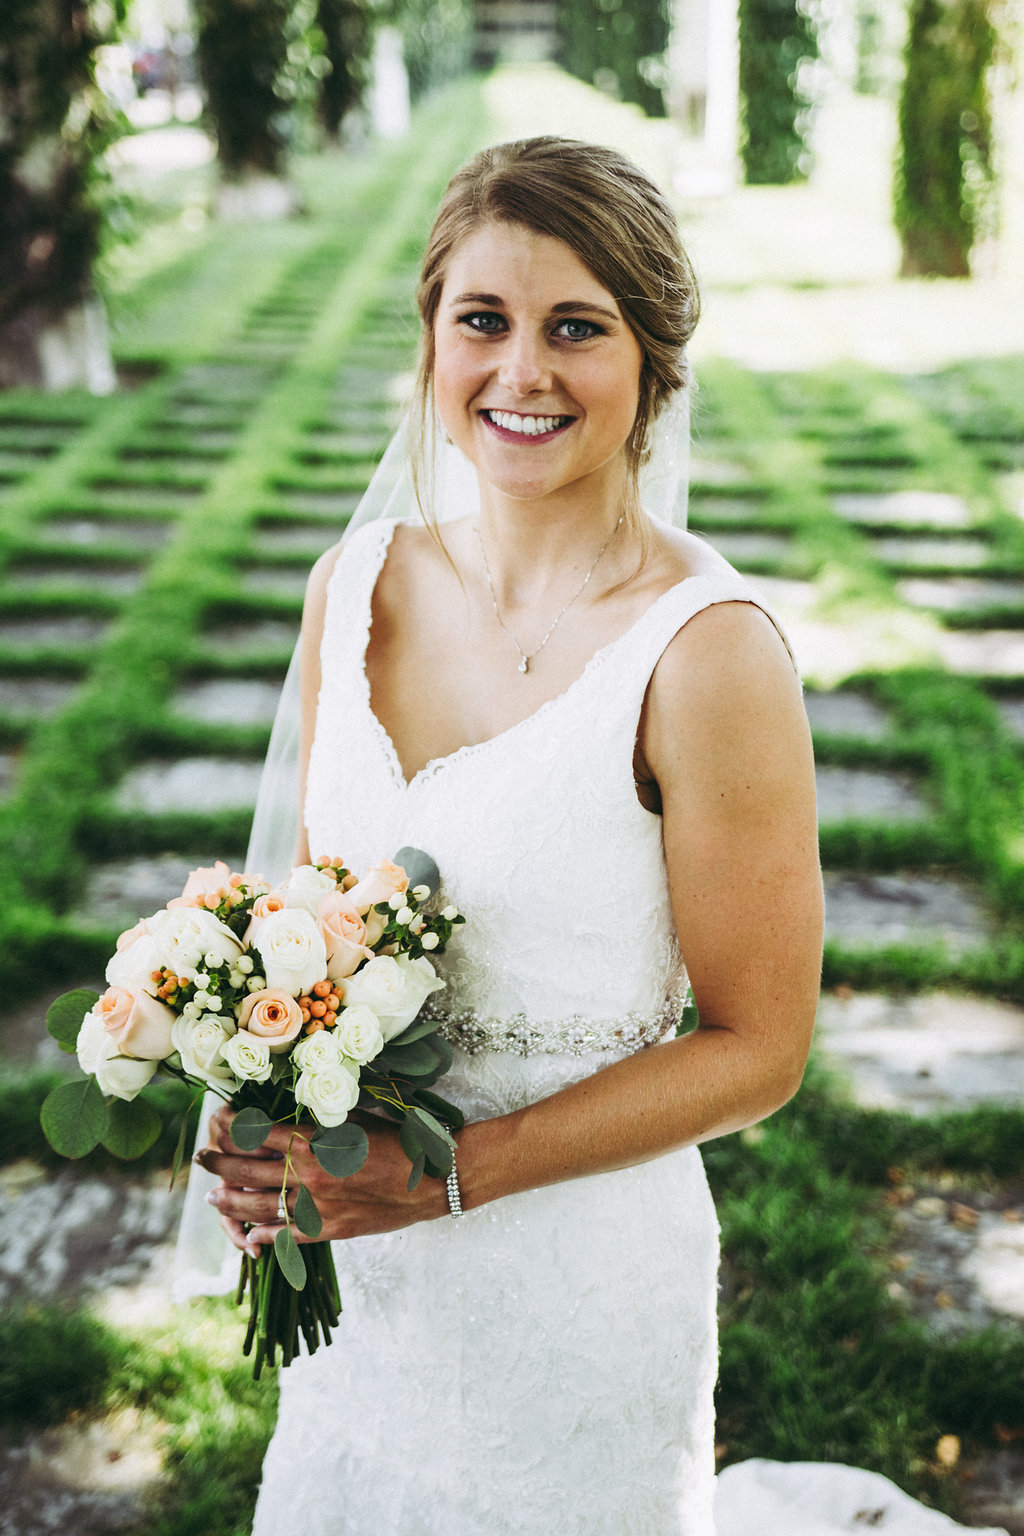 michelle+reid+wedding-297.jpg